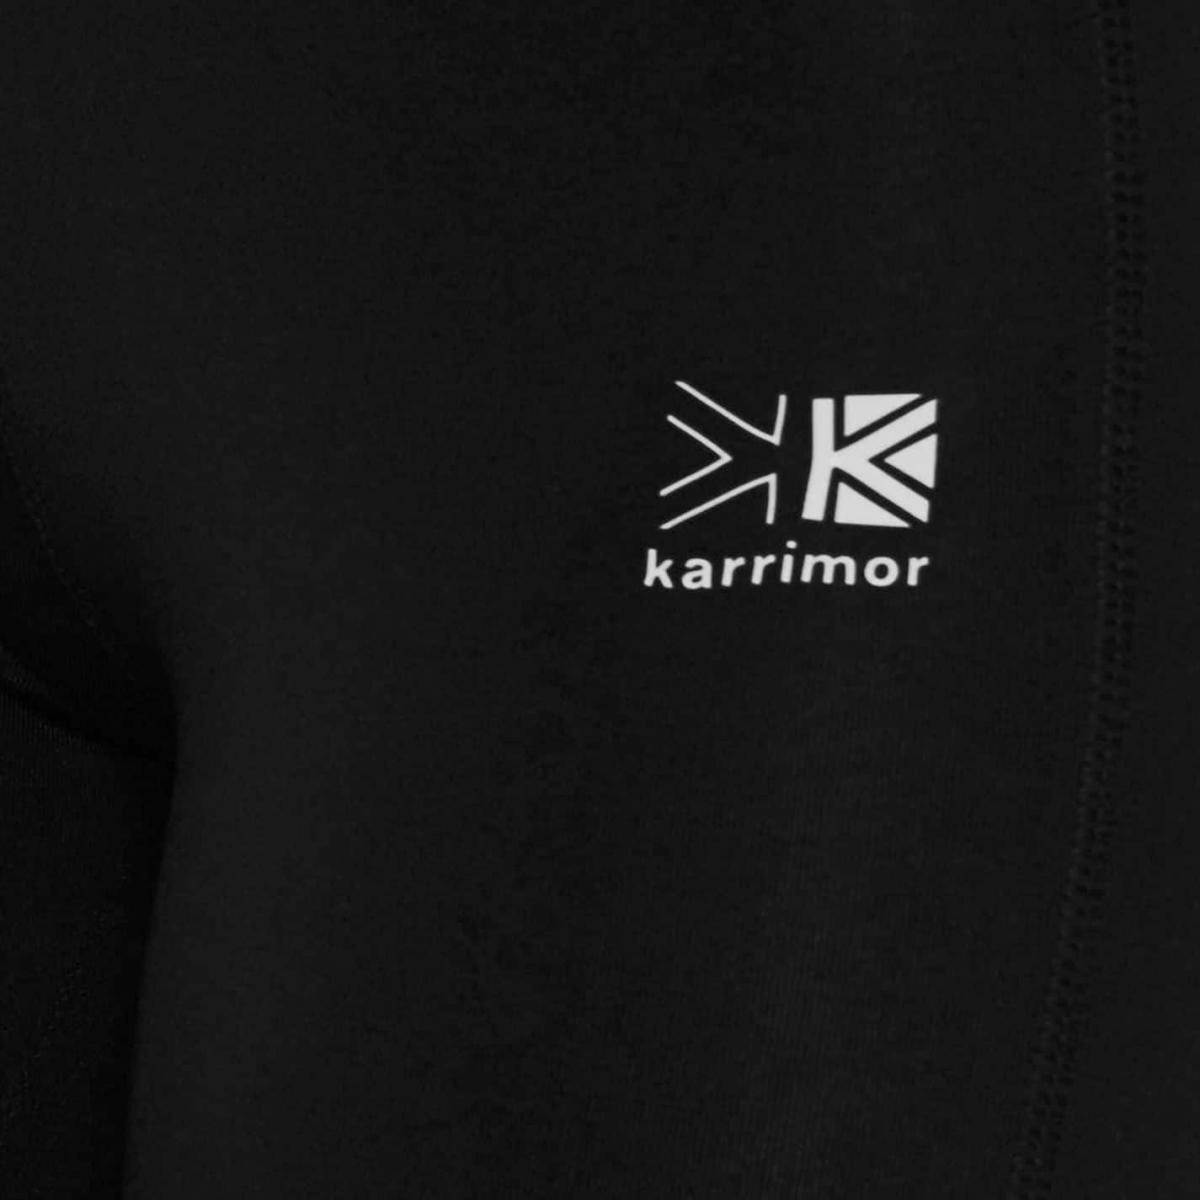 Karrimor Kurzhose Shorts Tights Damen